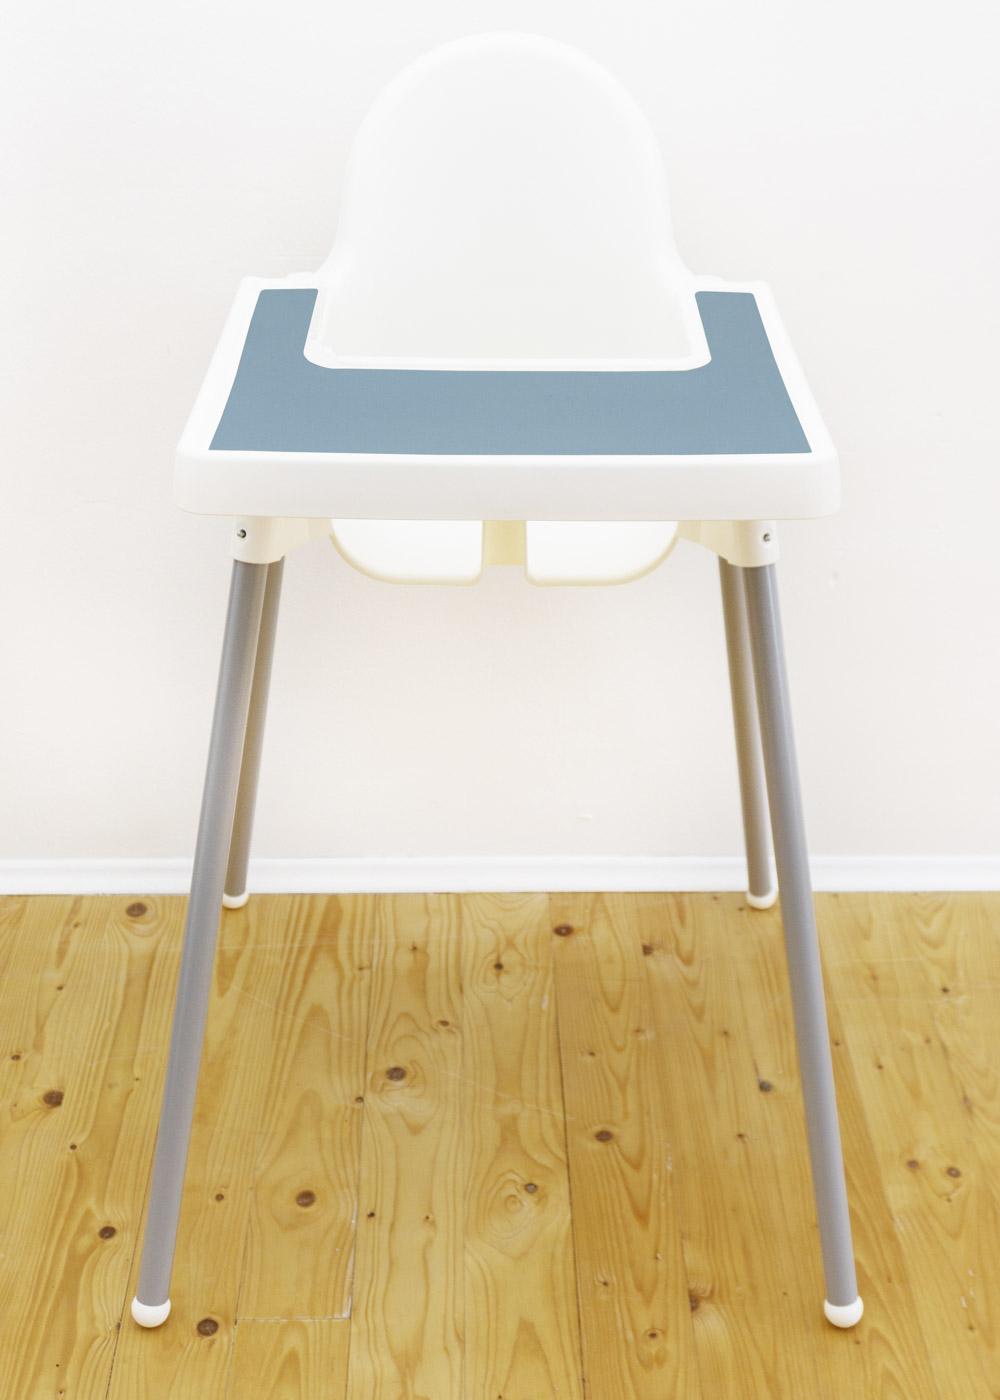 Silikonmatte Ikea Antilop Hochstuhl Klecka Mat nordisch blau Gesamtansicht